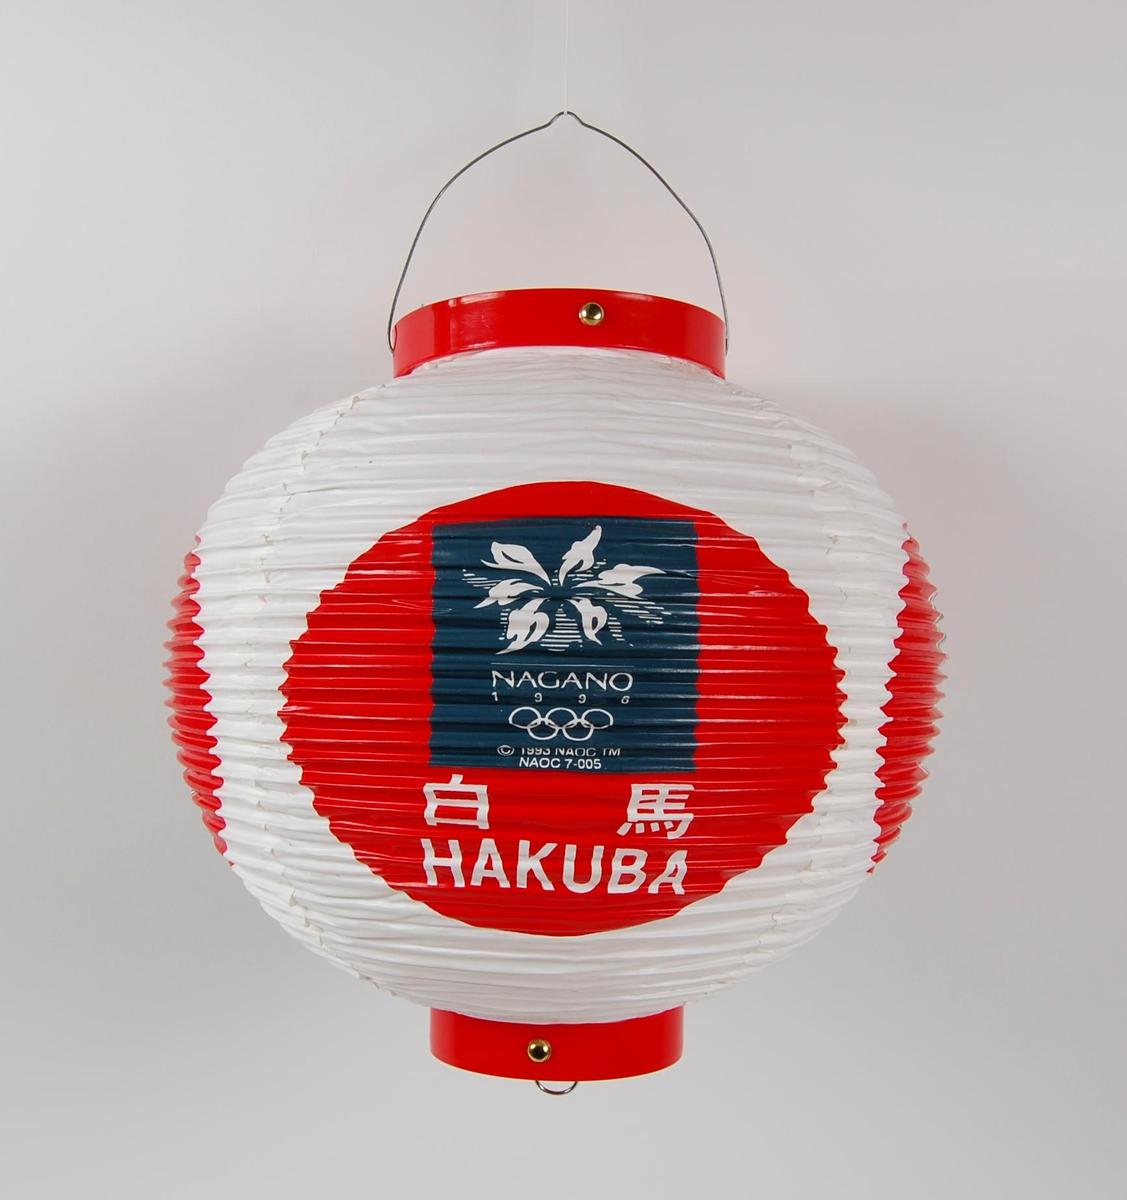 Rund lykt med logo for Paralympics i Nagano i 1998 og de olympiske vinterleker i Nagano i 1998. Lykta kan foldes sammen.